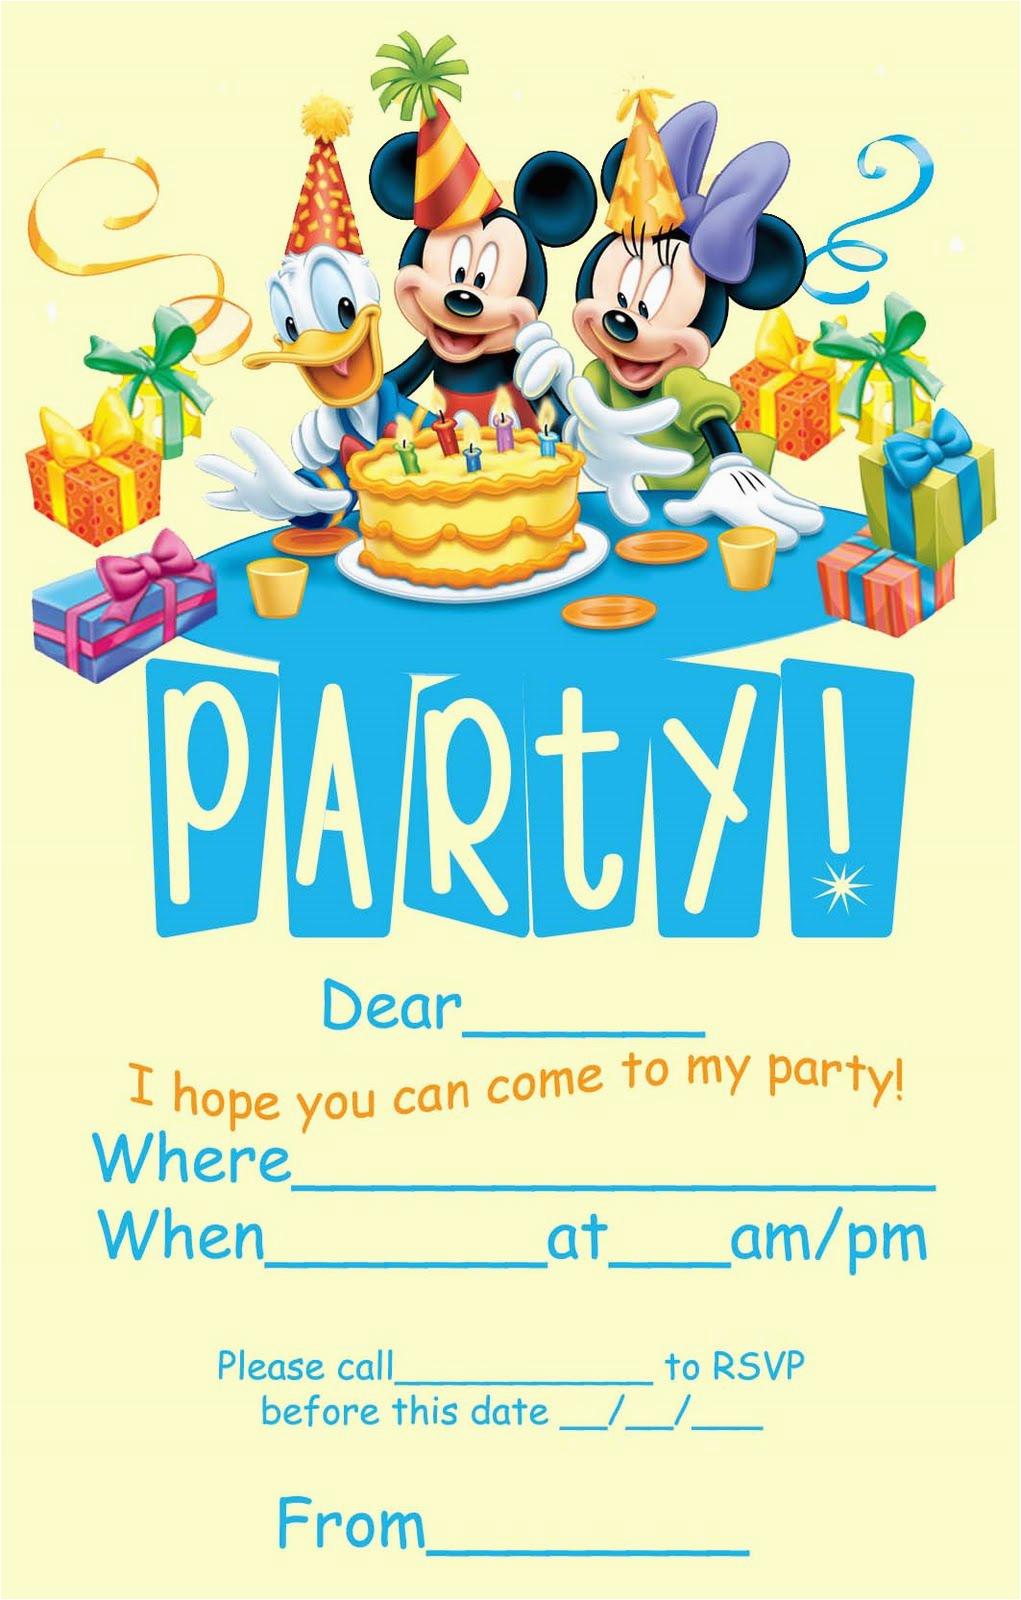 Disney Up Birthday Invitations How To Create Egreeting Ecards